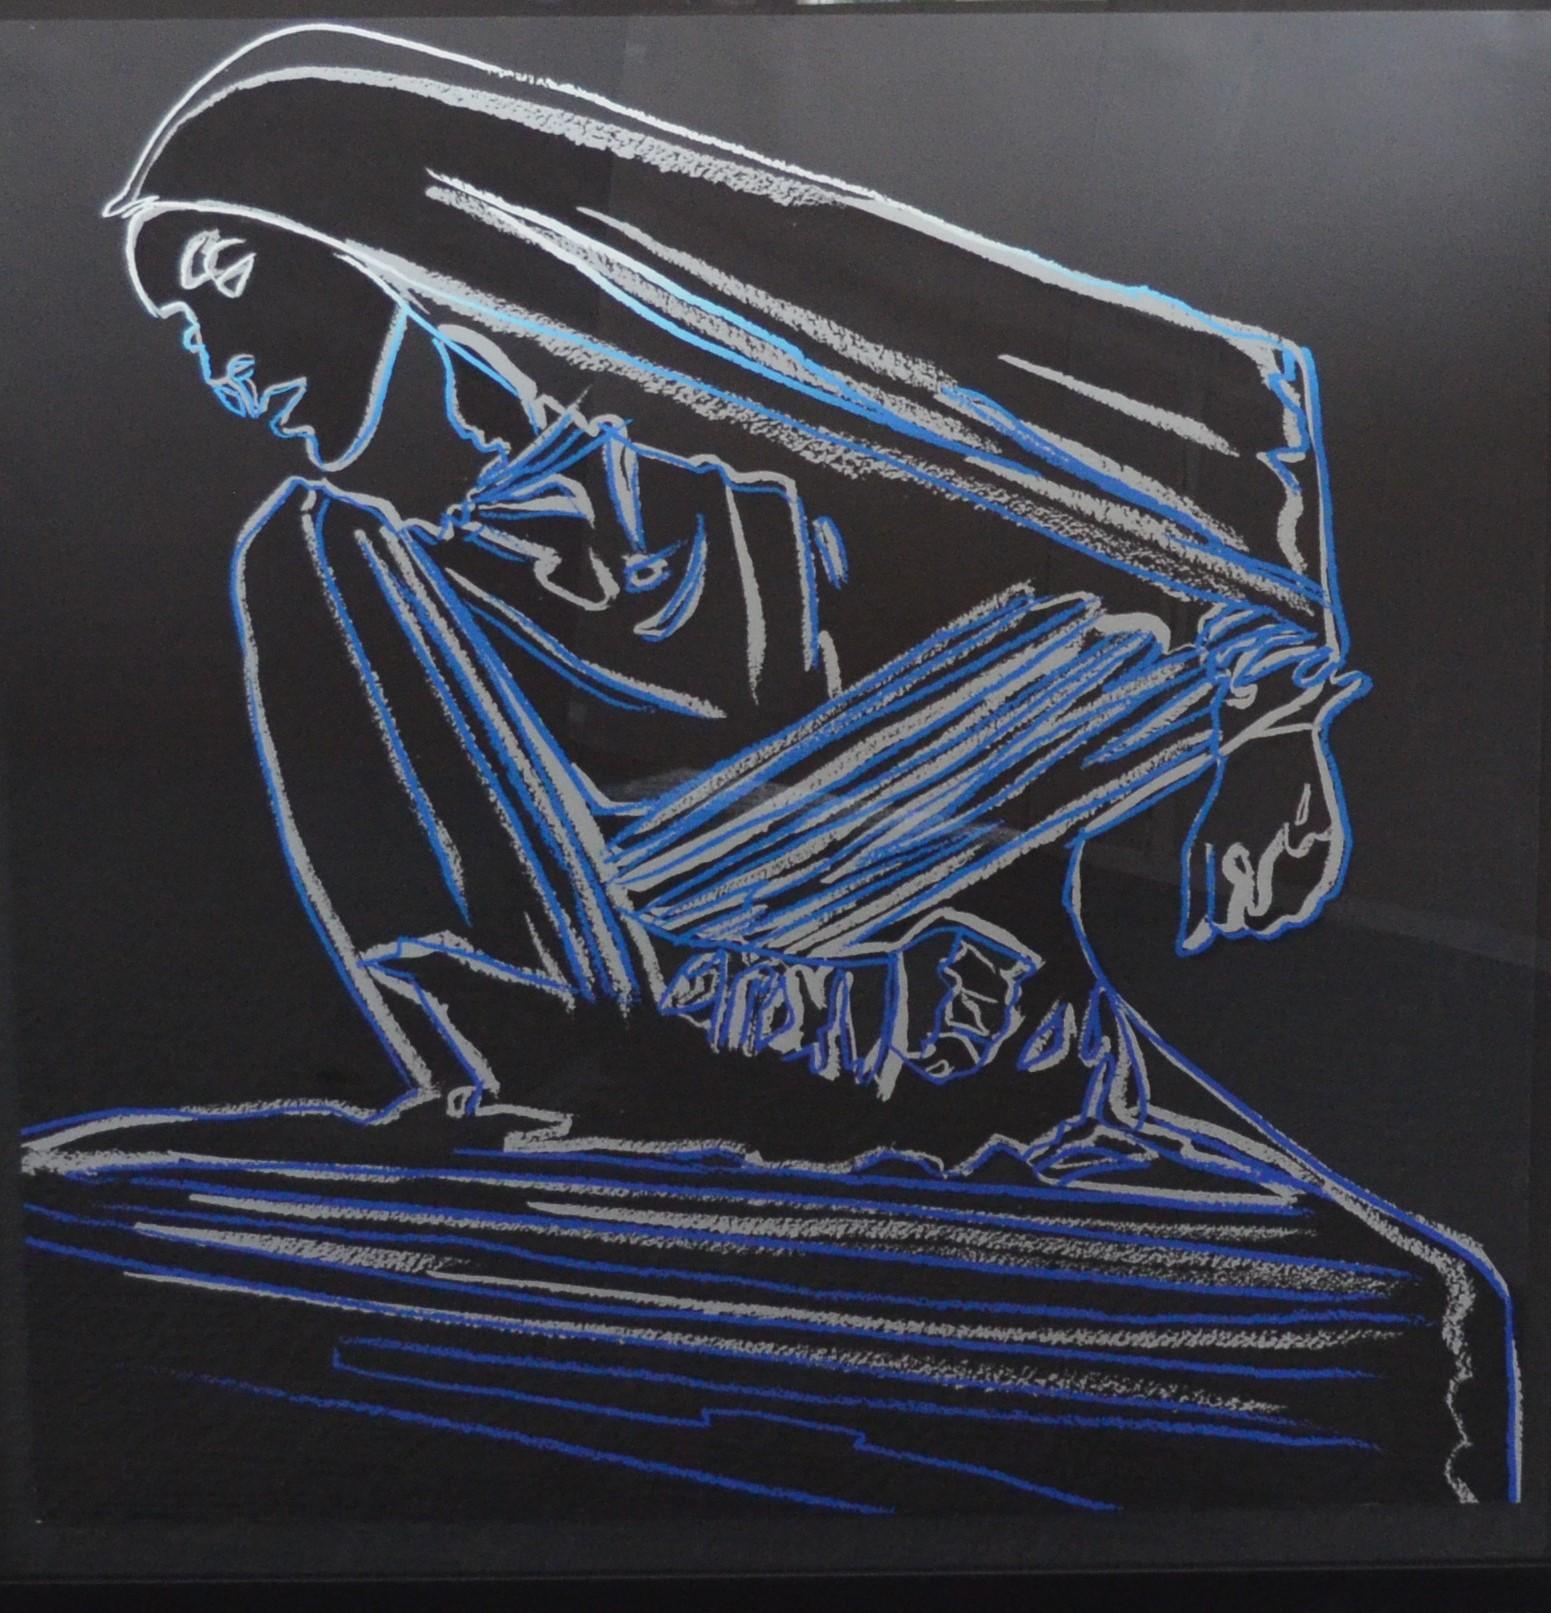 Andy Warhol - Lamenation